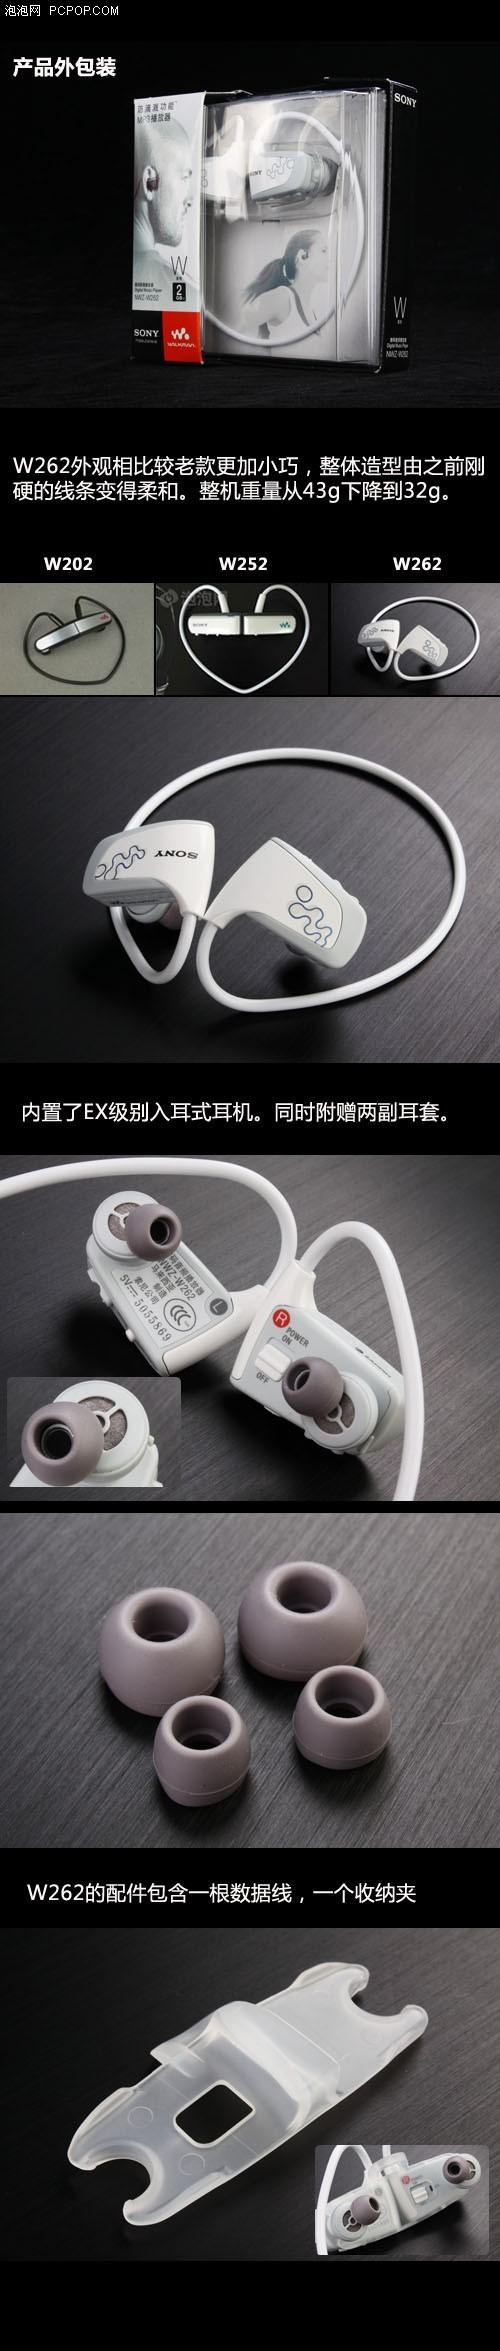 Walkman运动精神极致索尼W262抢先测